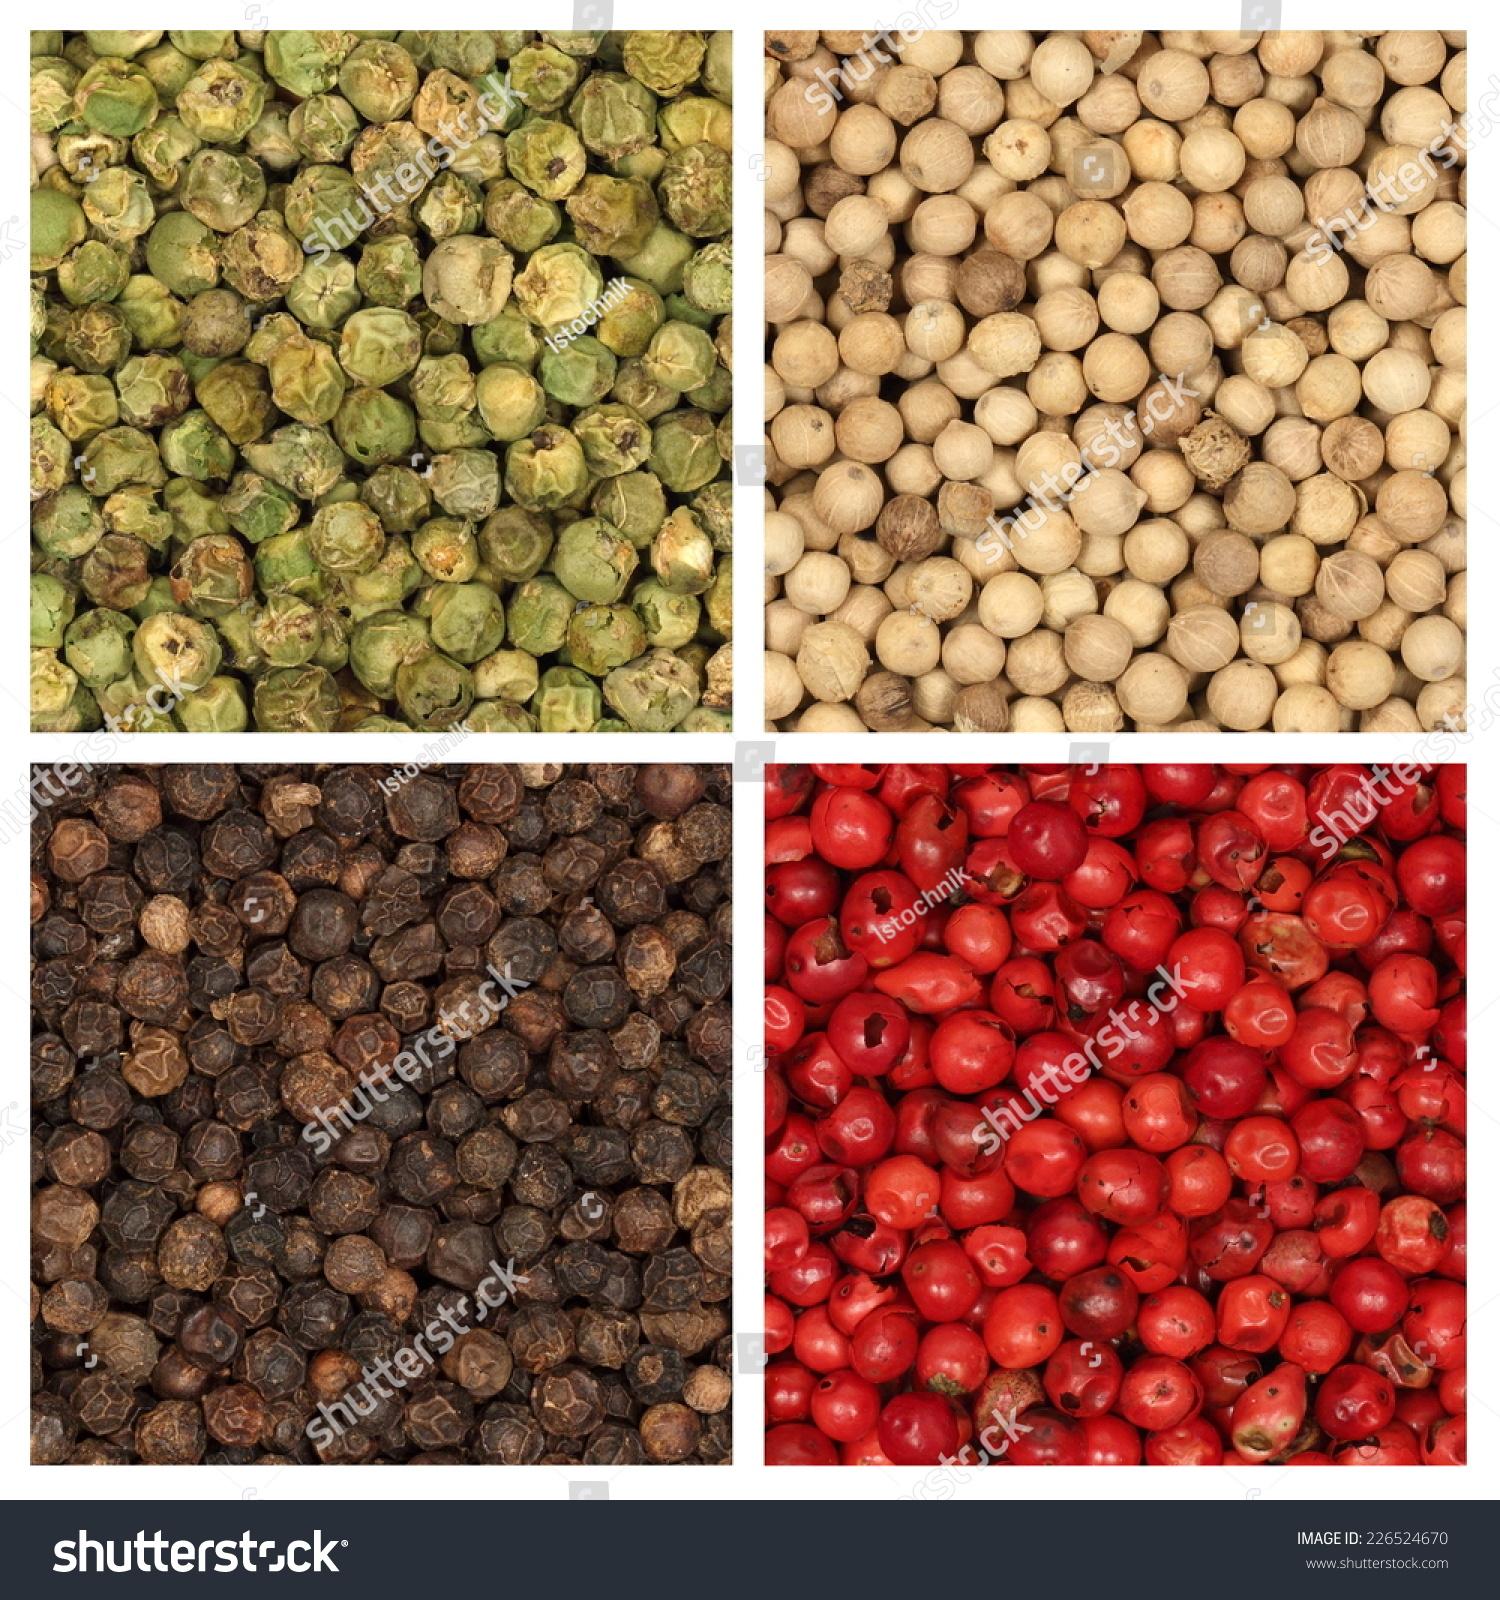 Where can i find white pepper